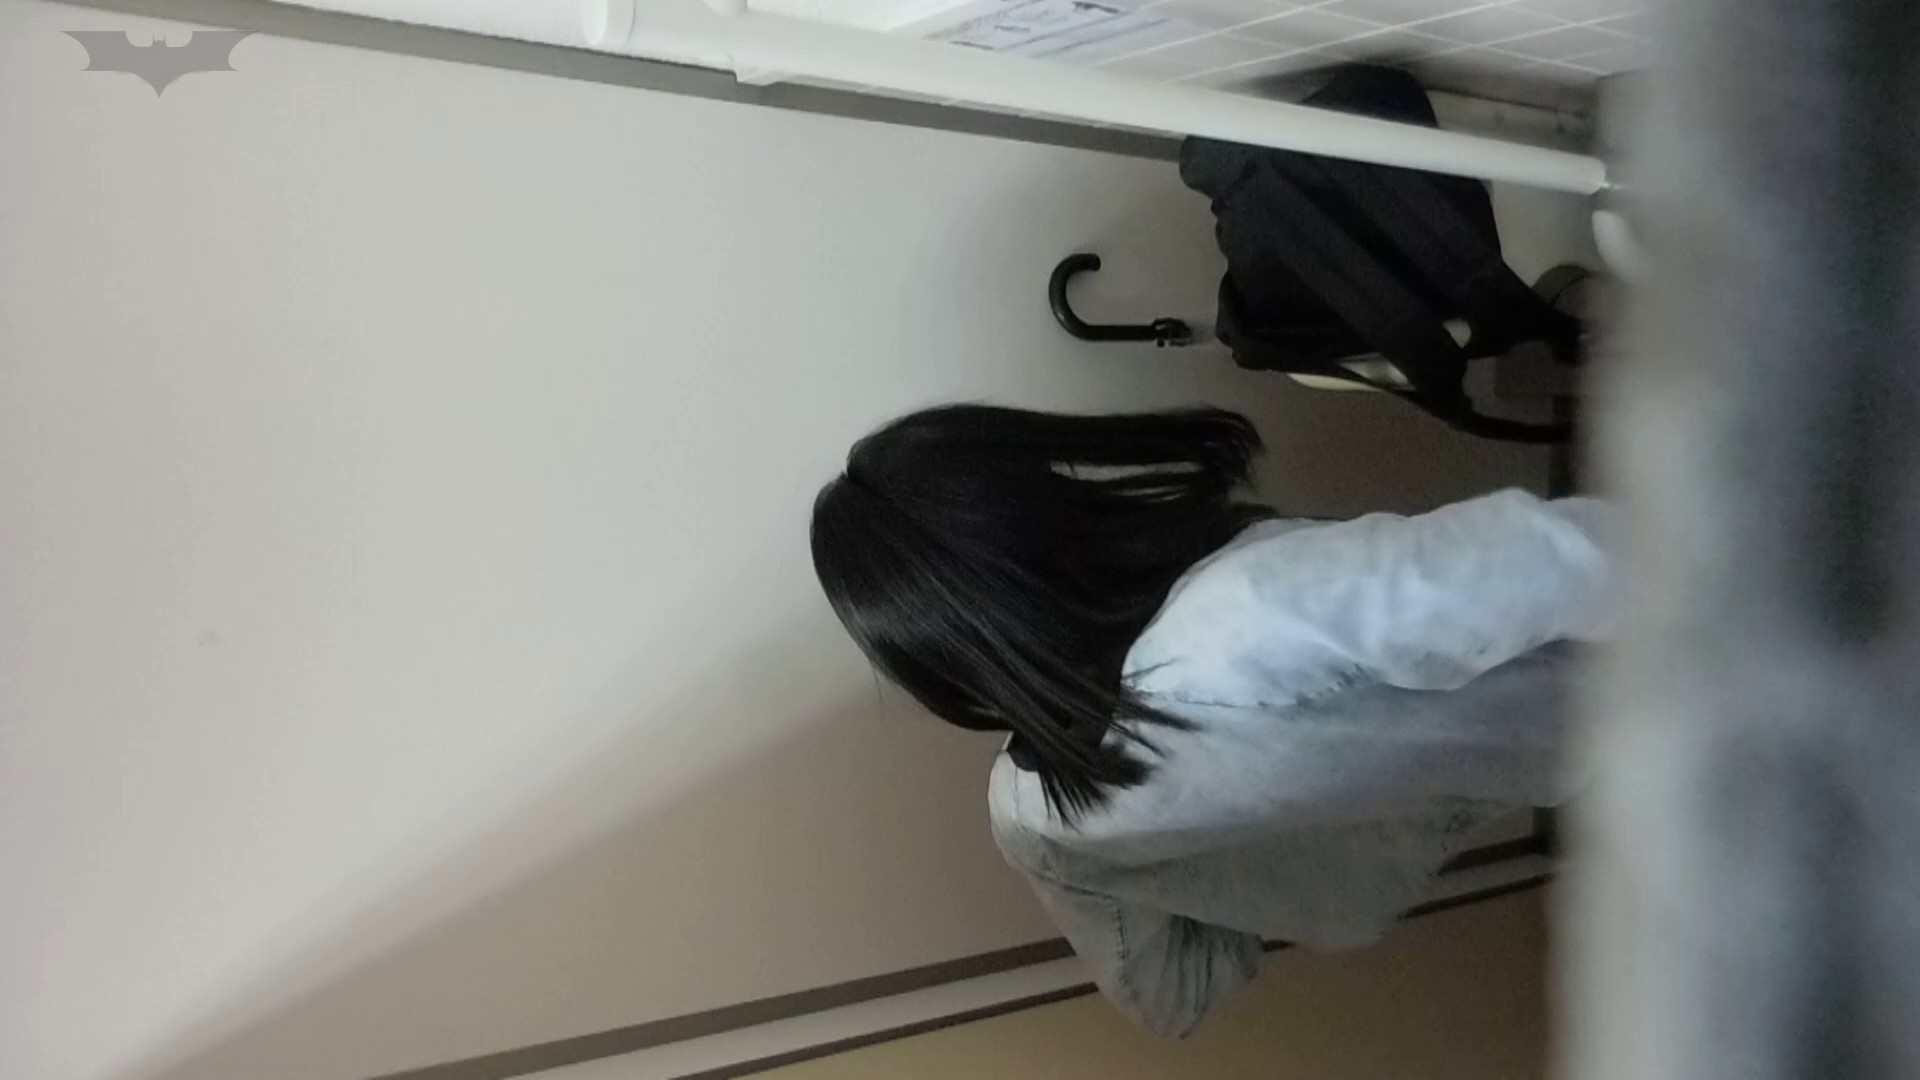 化粧室絵巻 駅舎編 VOL.19 高画質動画 AV無料動画キャプチャ 72画像 64